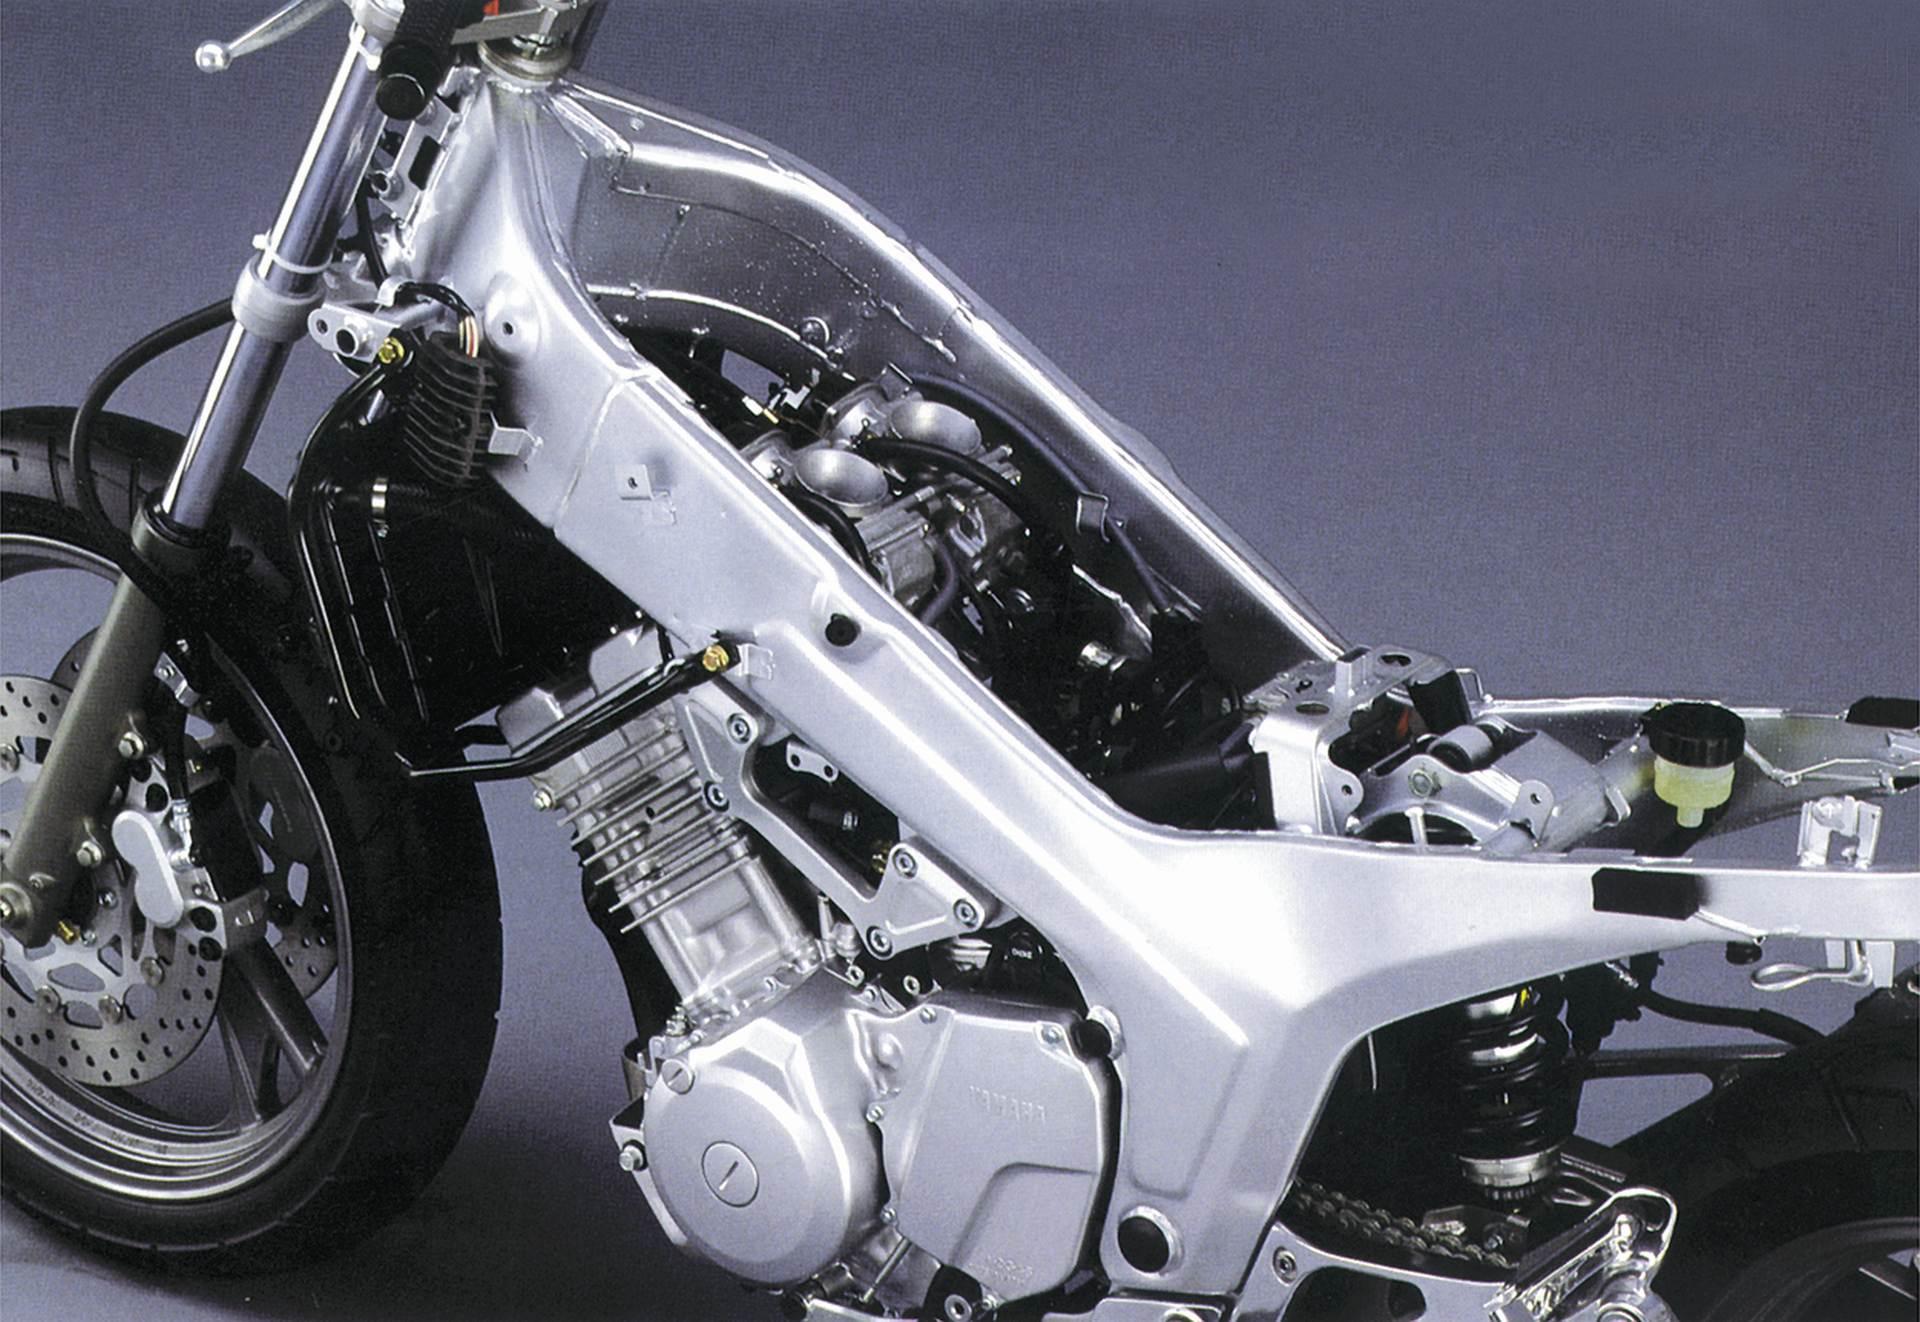 Yamaha TDM 900 - motocykl używany